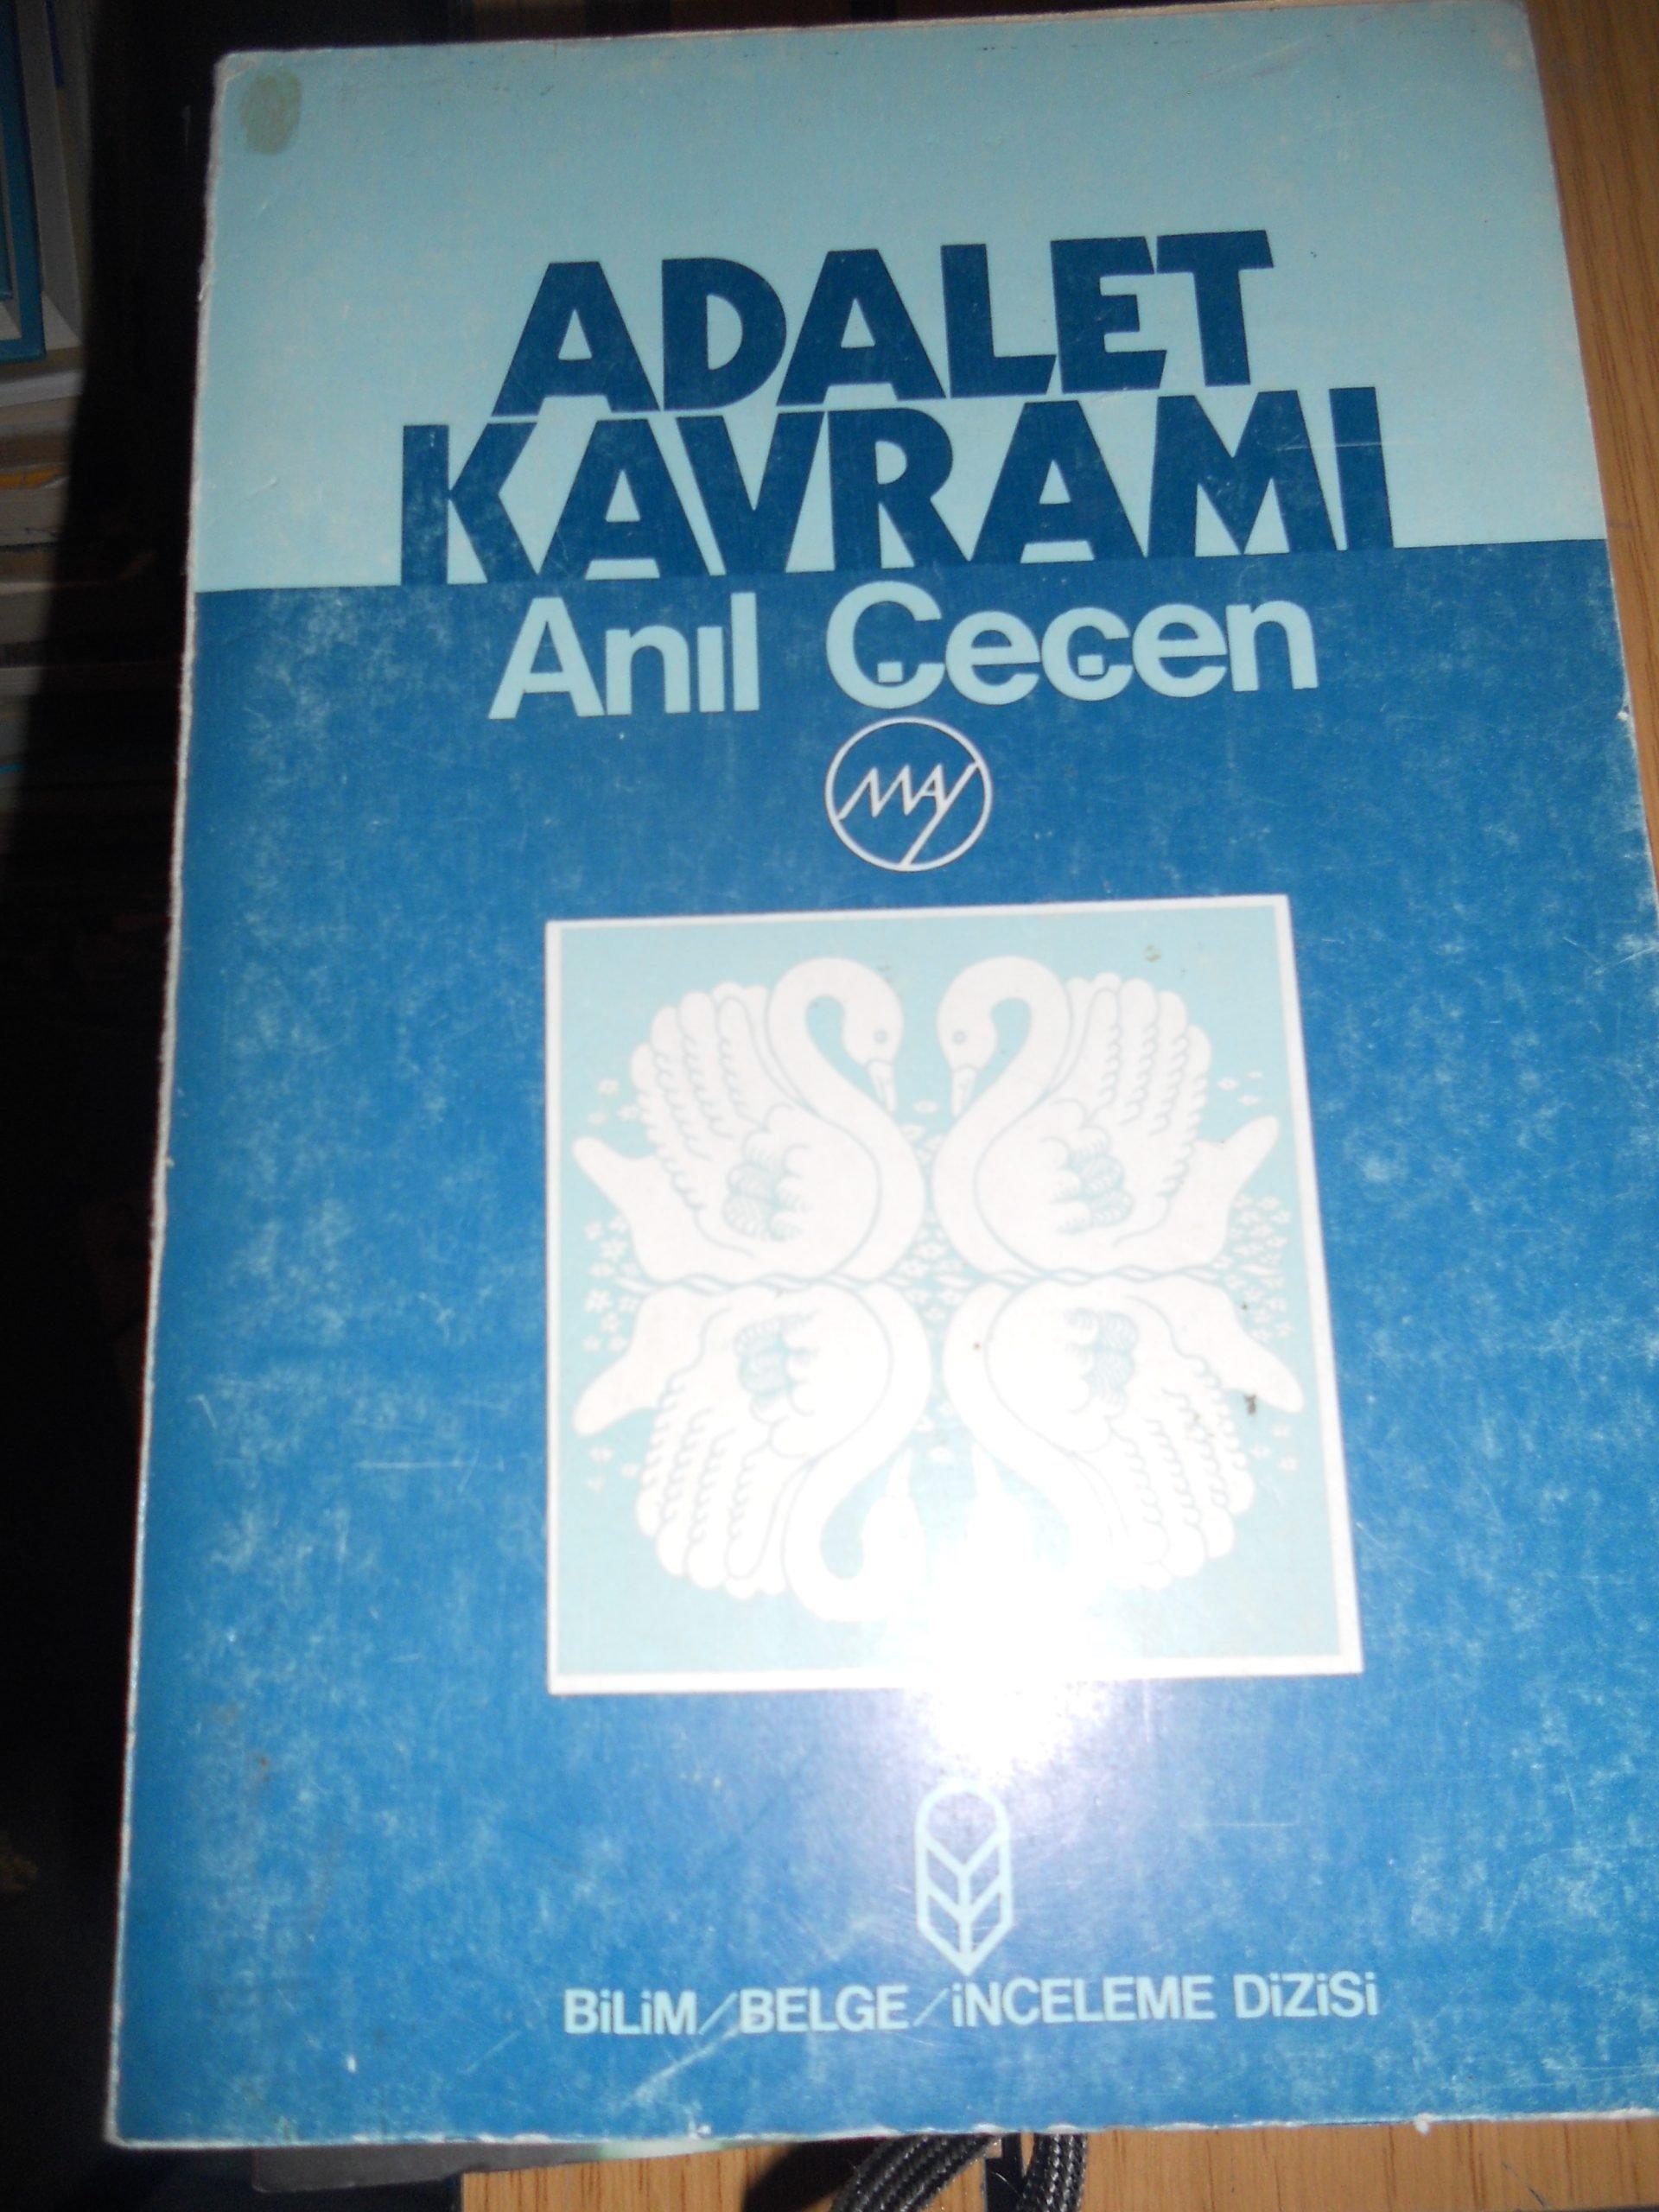 ADALET KAVRAMI/Anıl ÇEÇEN/ 20TL